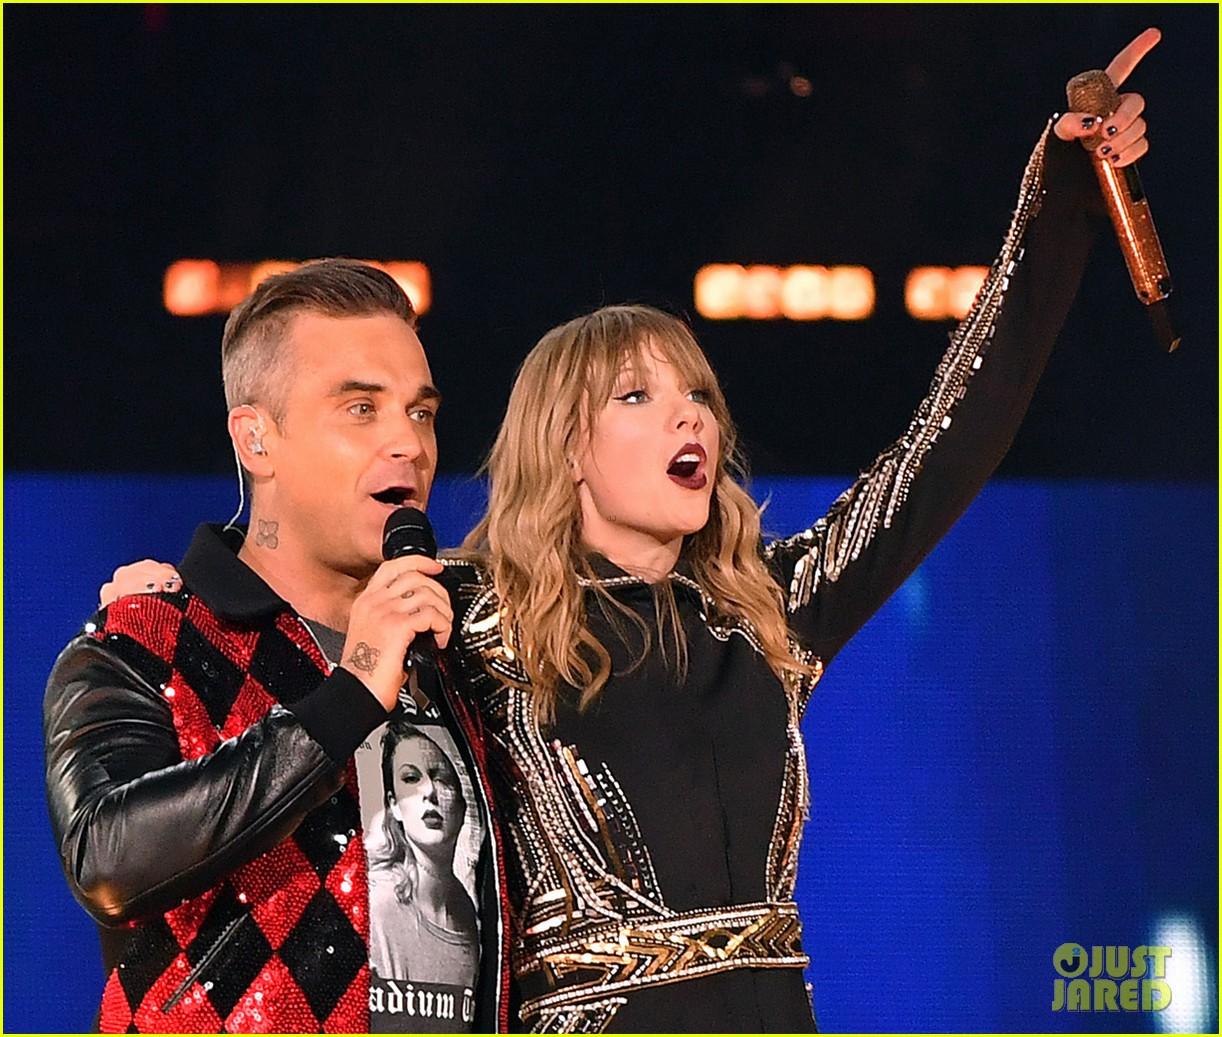 Angels-Taylor Swift και Robbie Williams